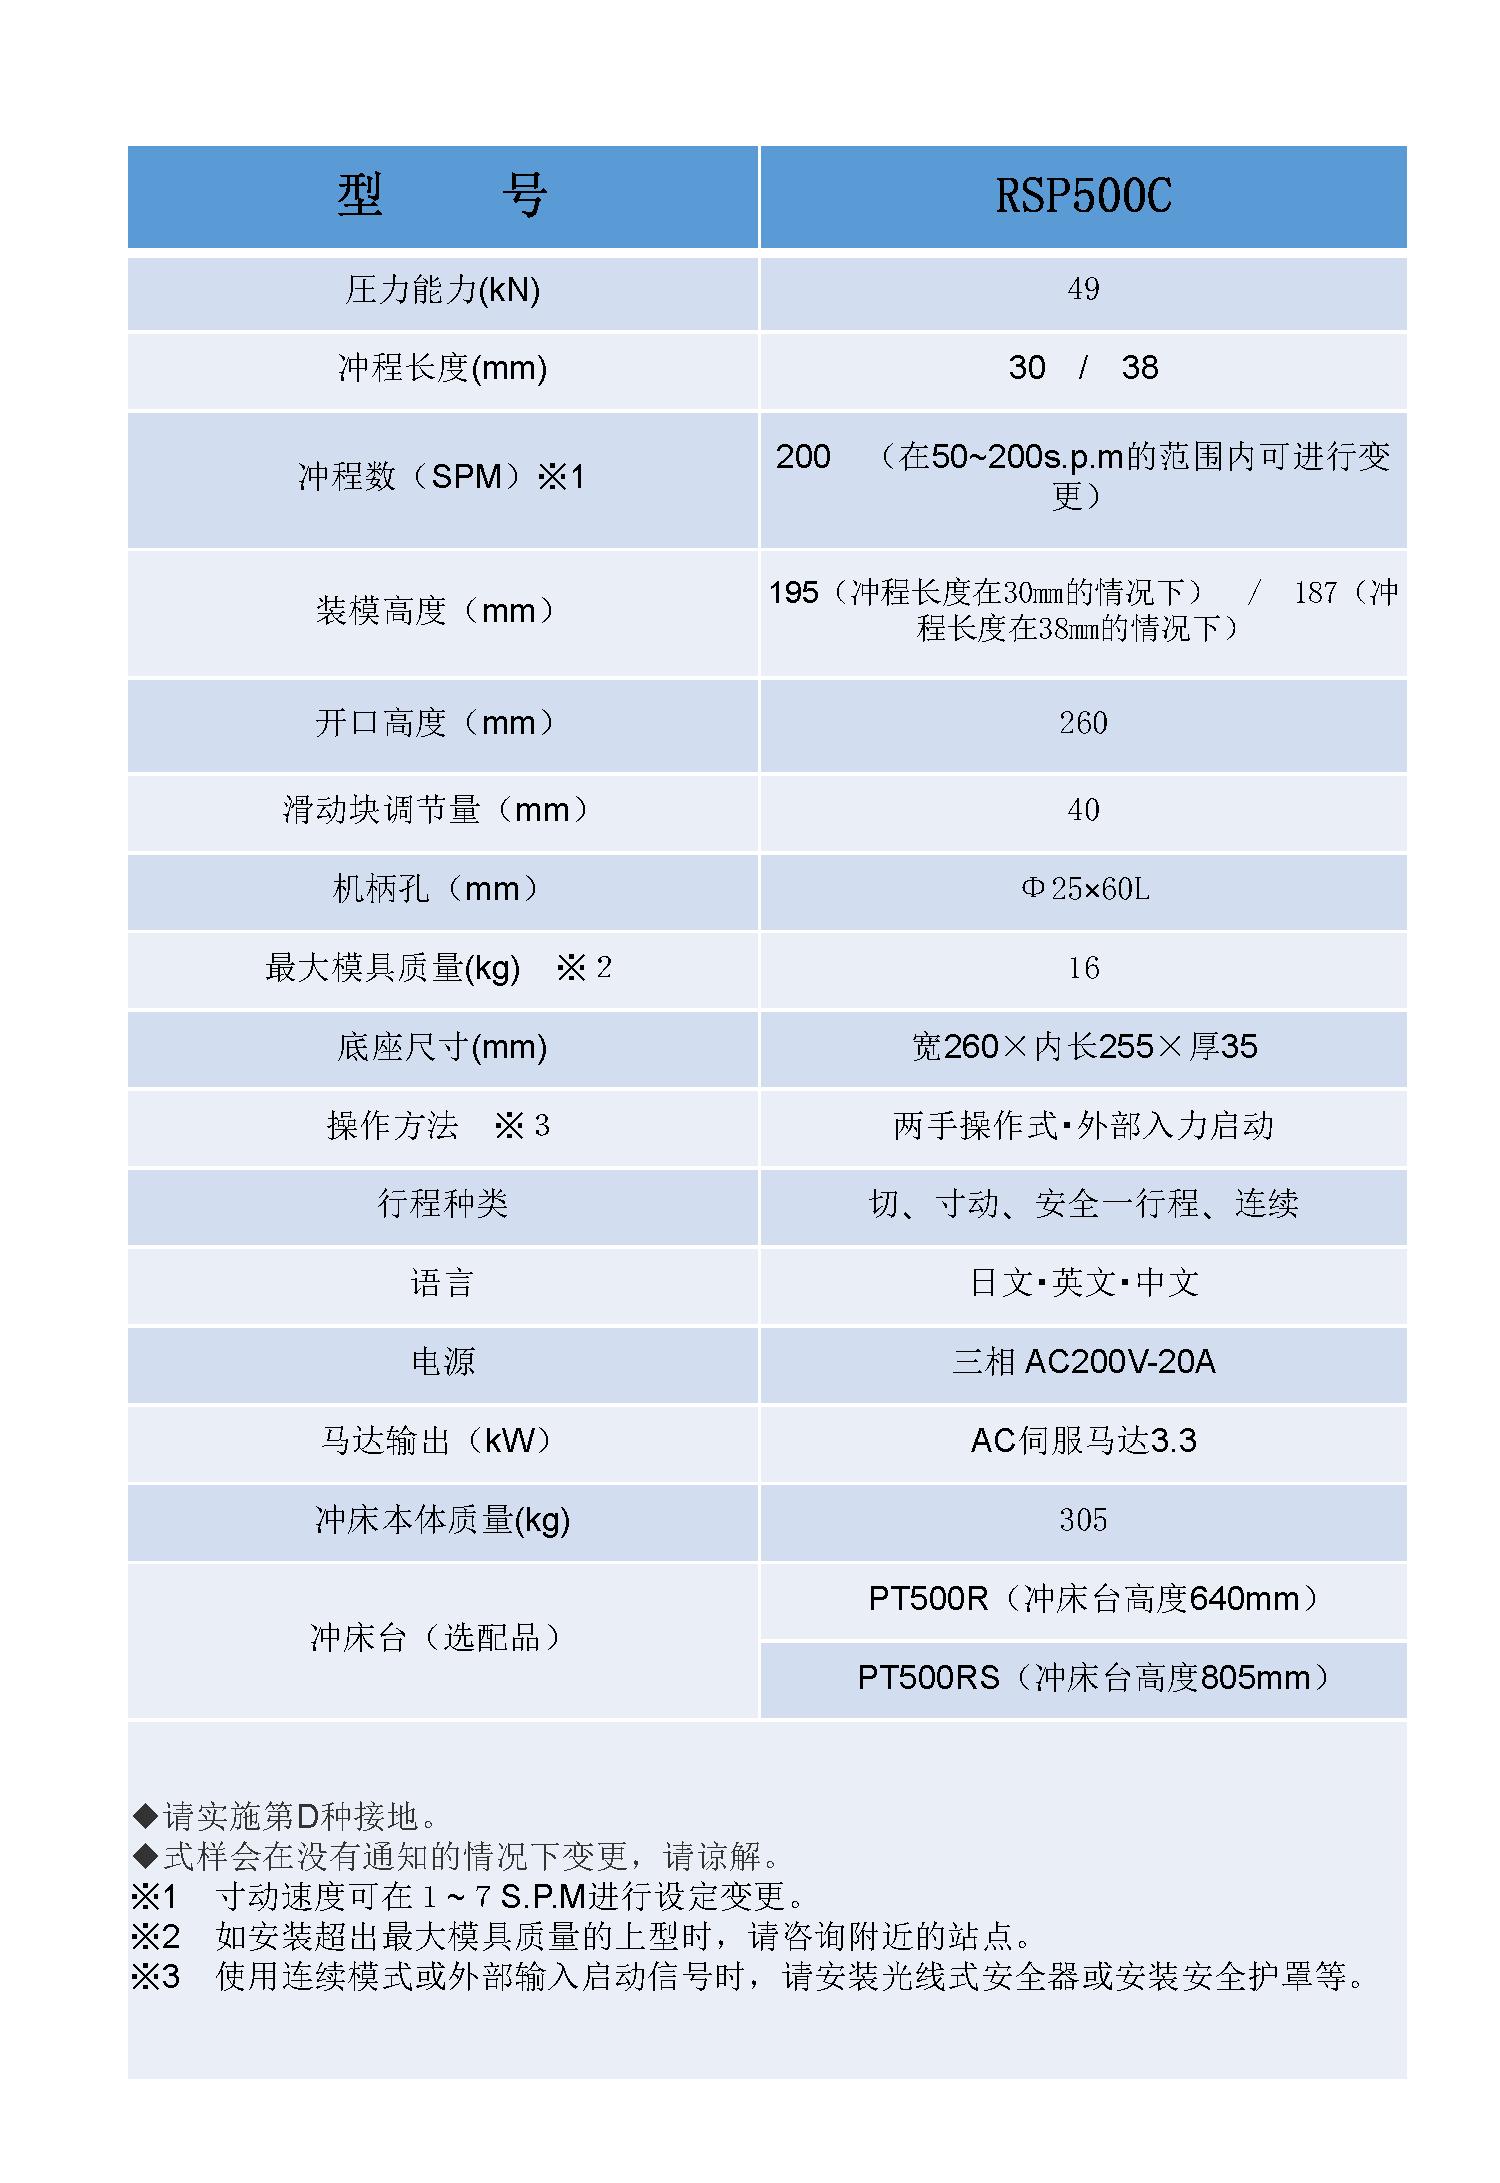 RSP500C_仕様 - 中文.png